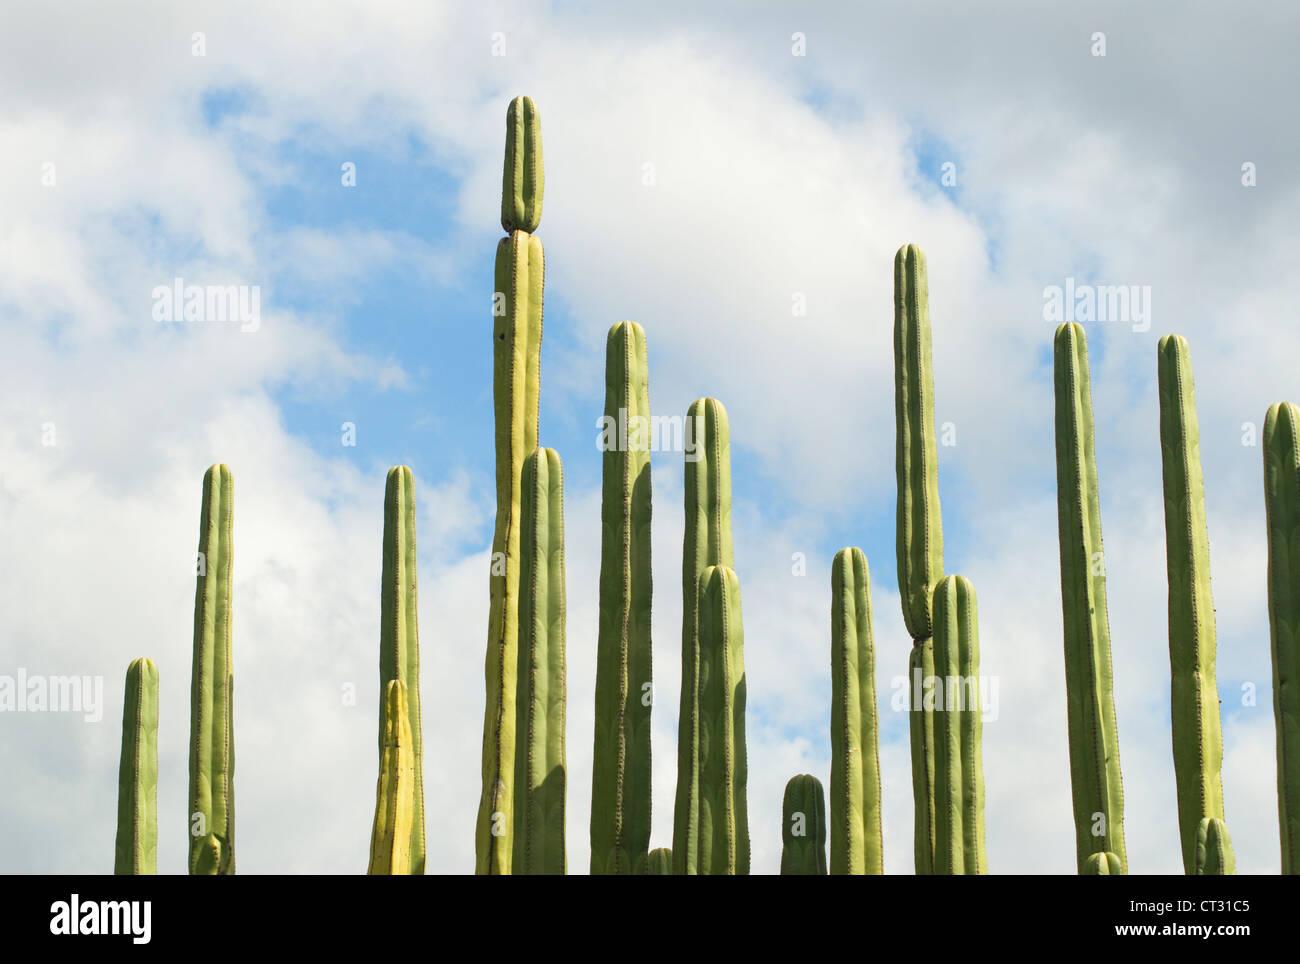 Pachycereus Marginatus, Cactus, vallado de cactus mexicanos Imagen De Stock